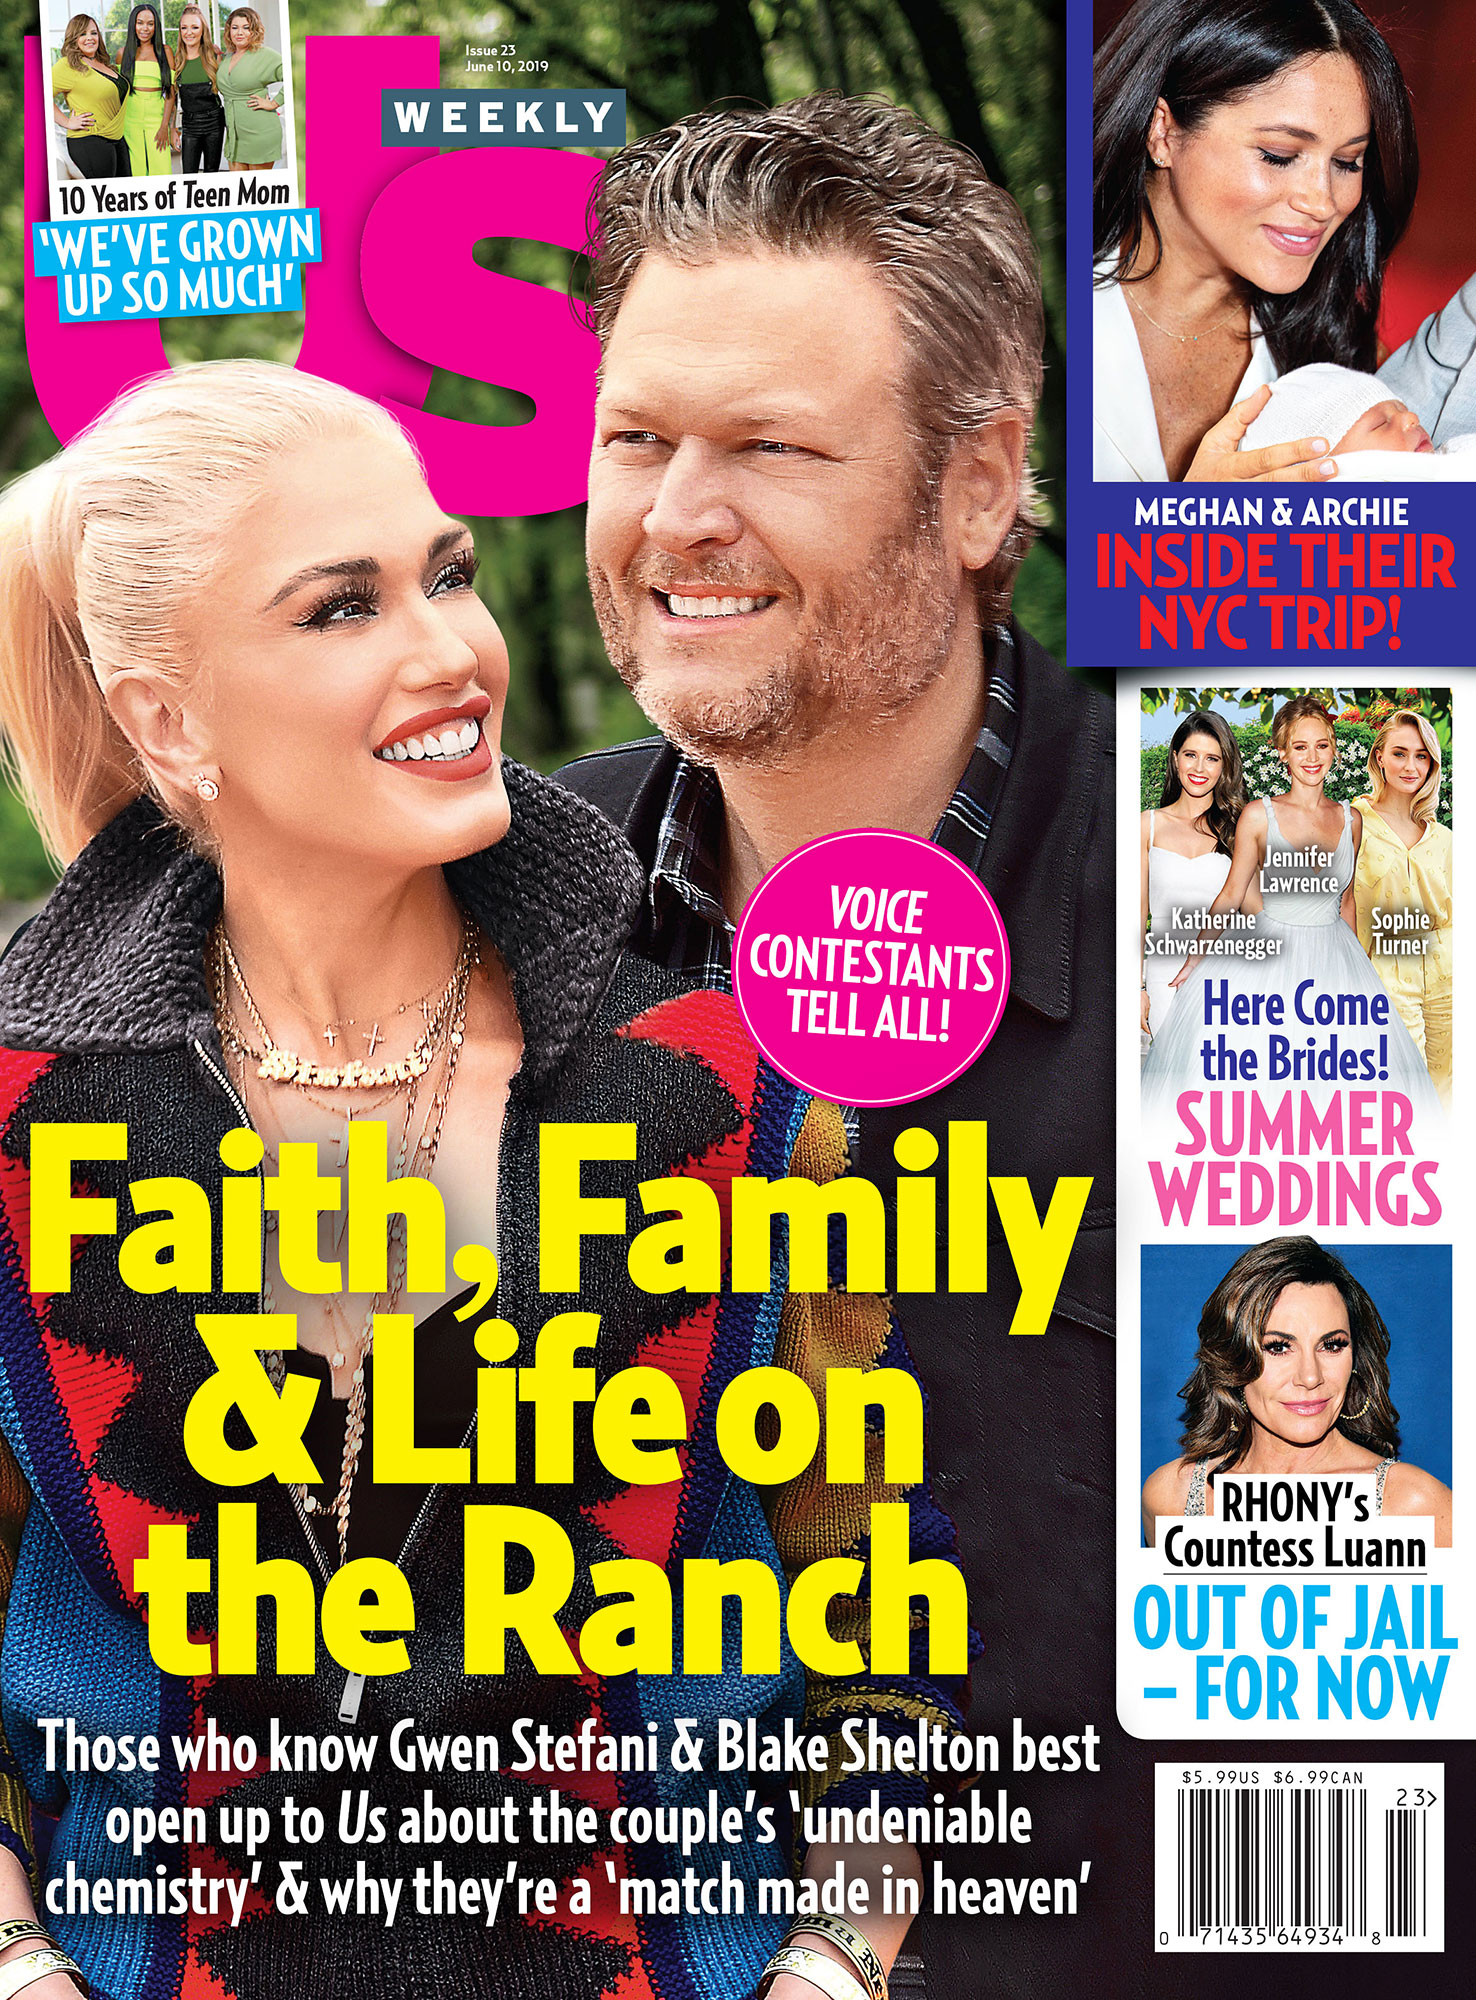 Prince Harry Megan Archie Adjusting to Parenthood UW2319 Us Weekly Cover Gwen Stefani Blake Shelton